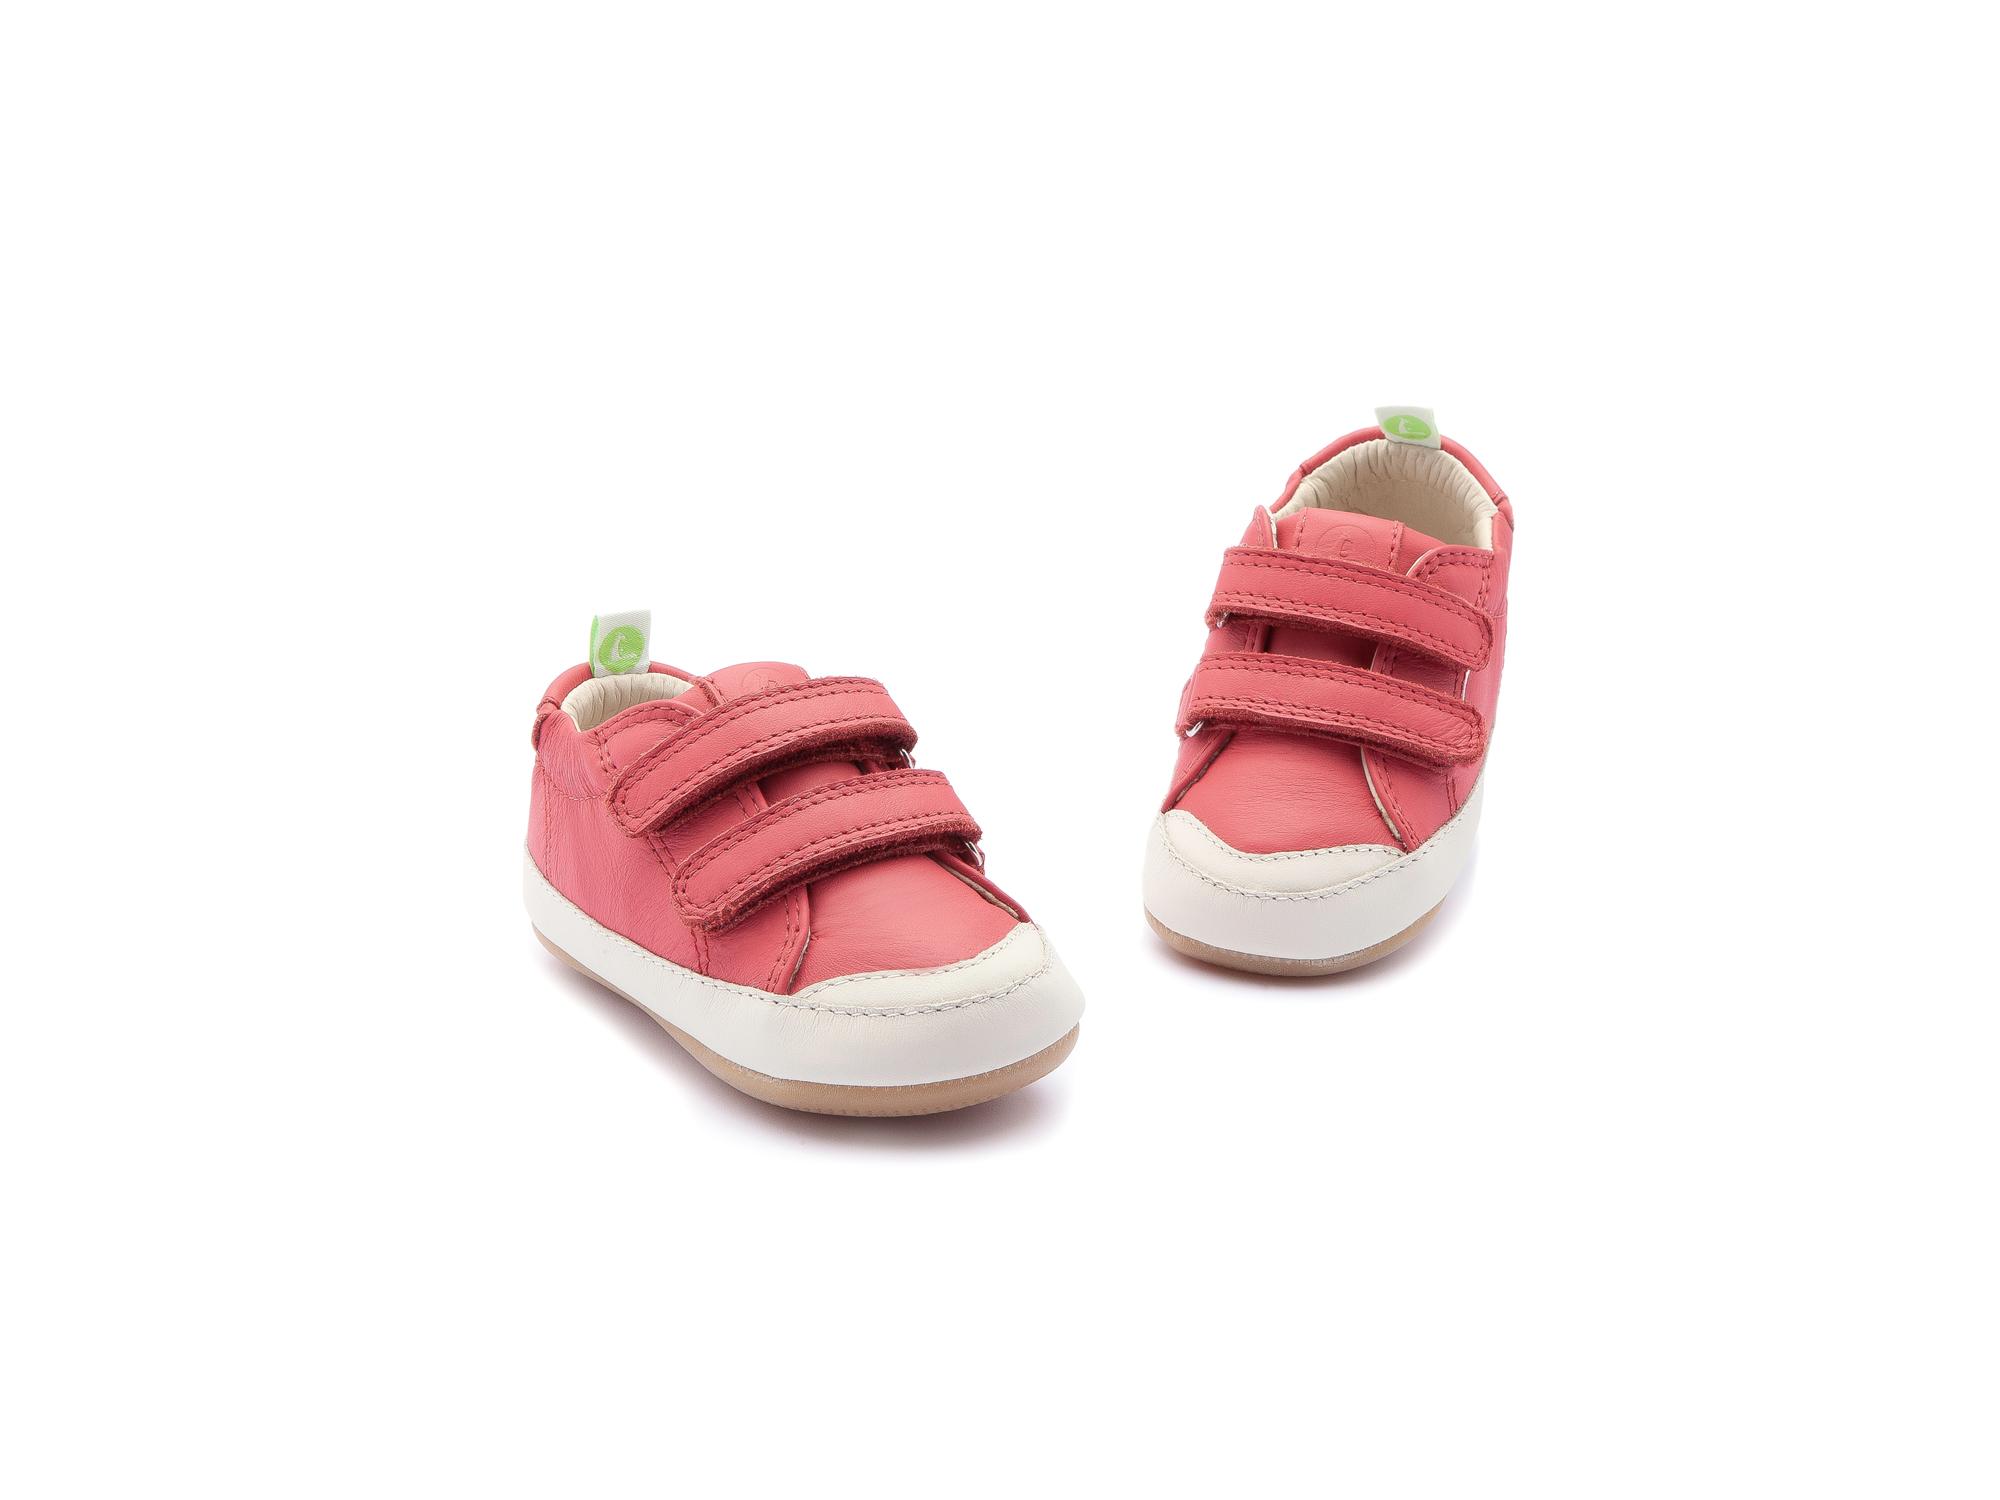 Tênis Bossy Cranberry/ Tapioca Baby 0 à 2 anos - 3